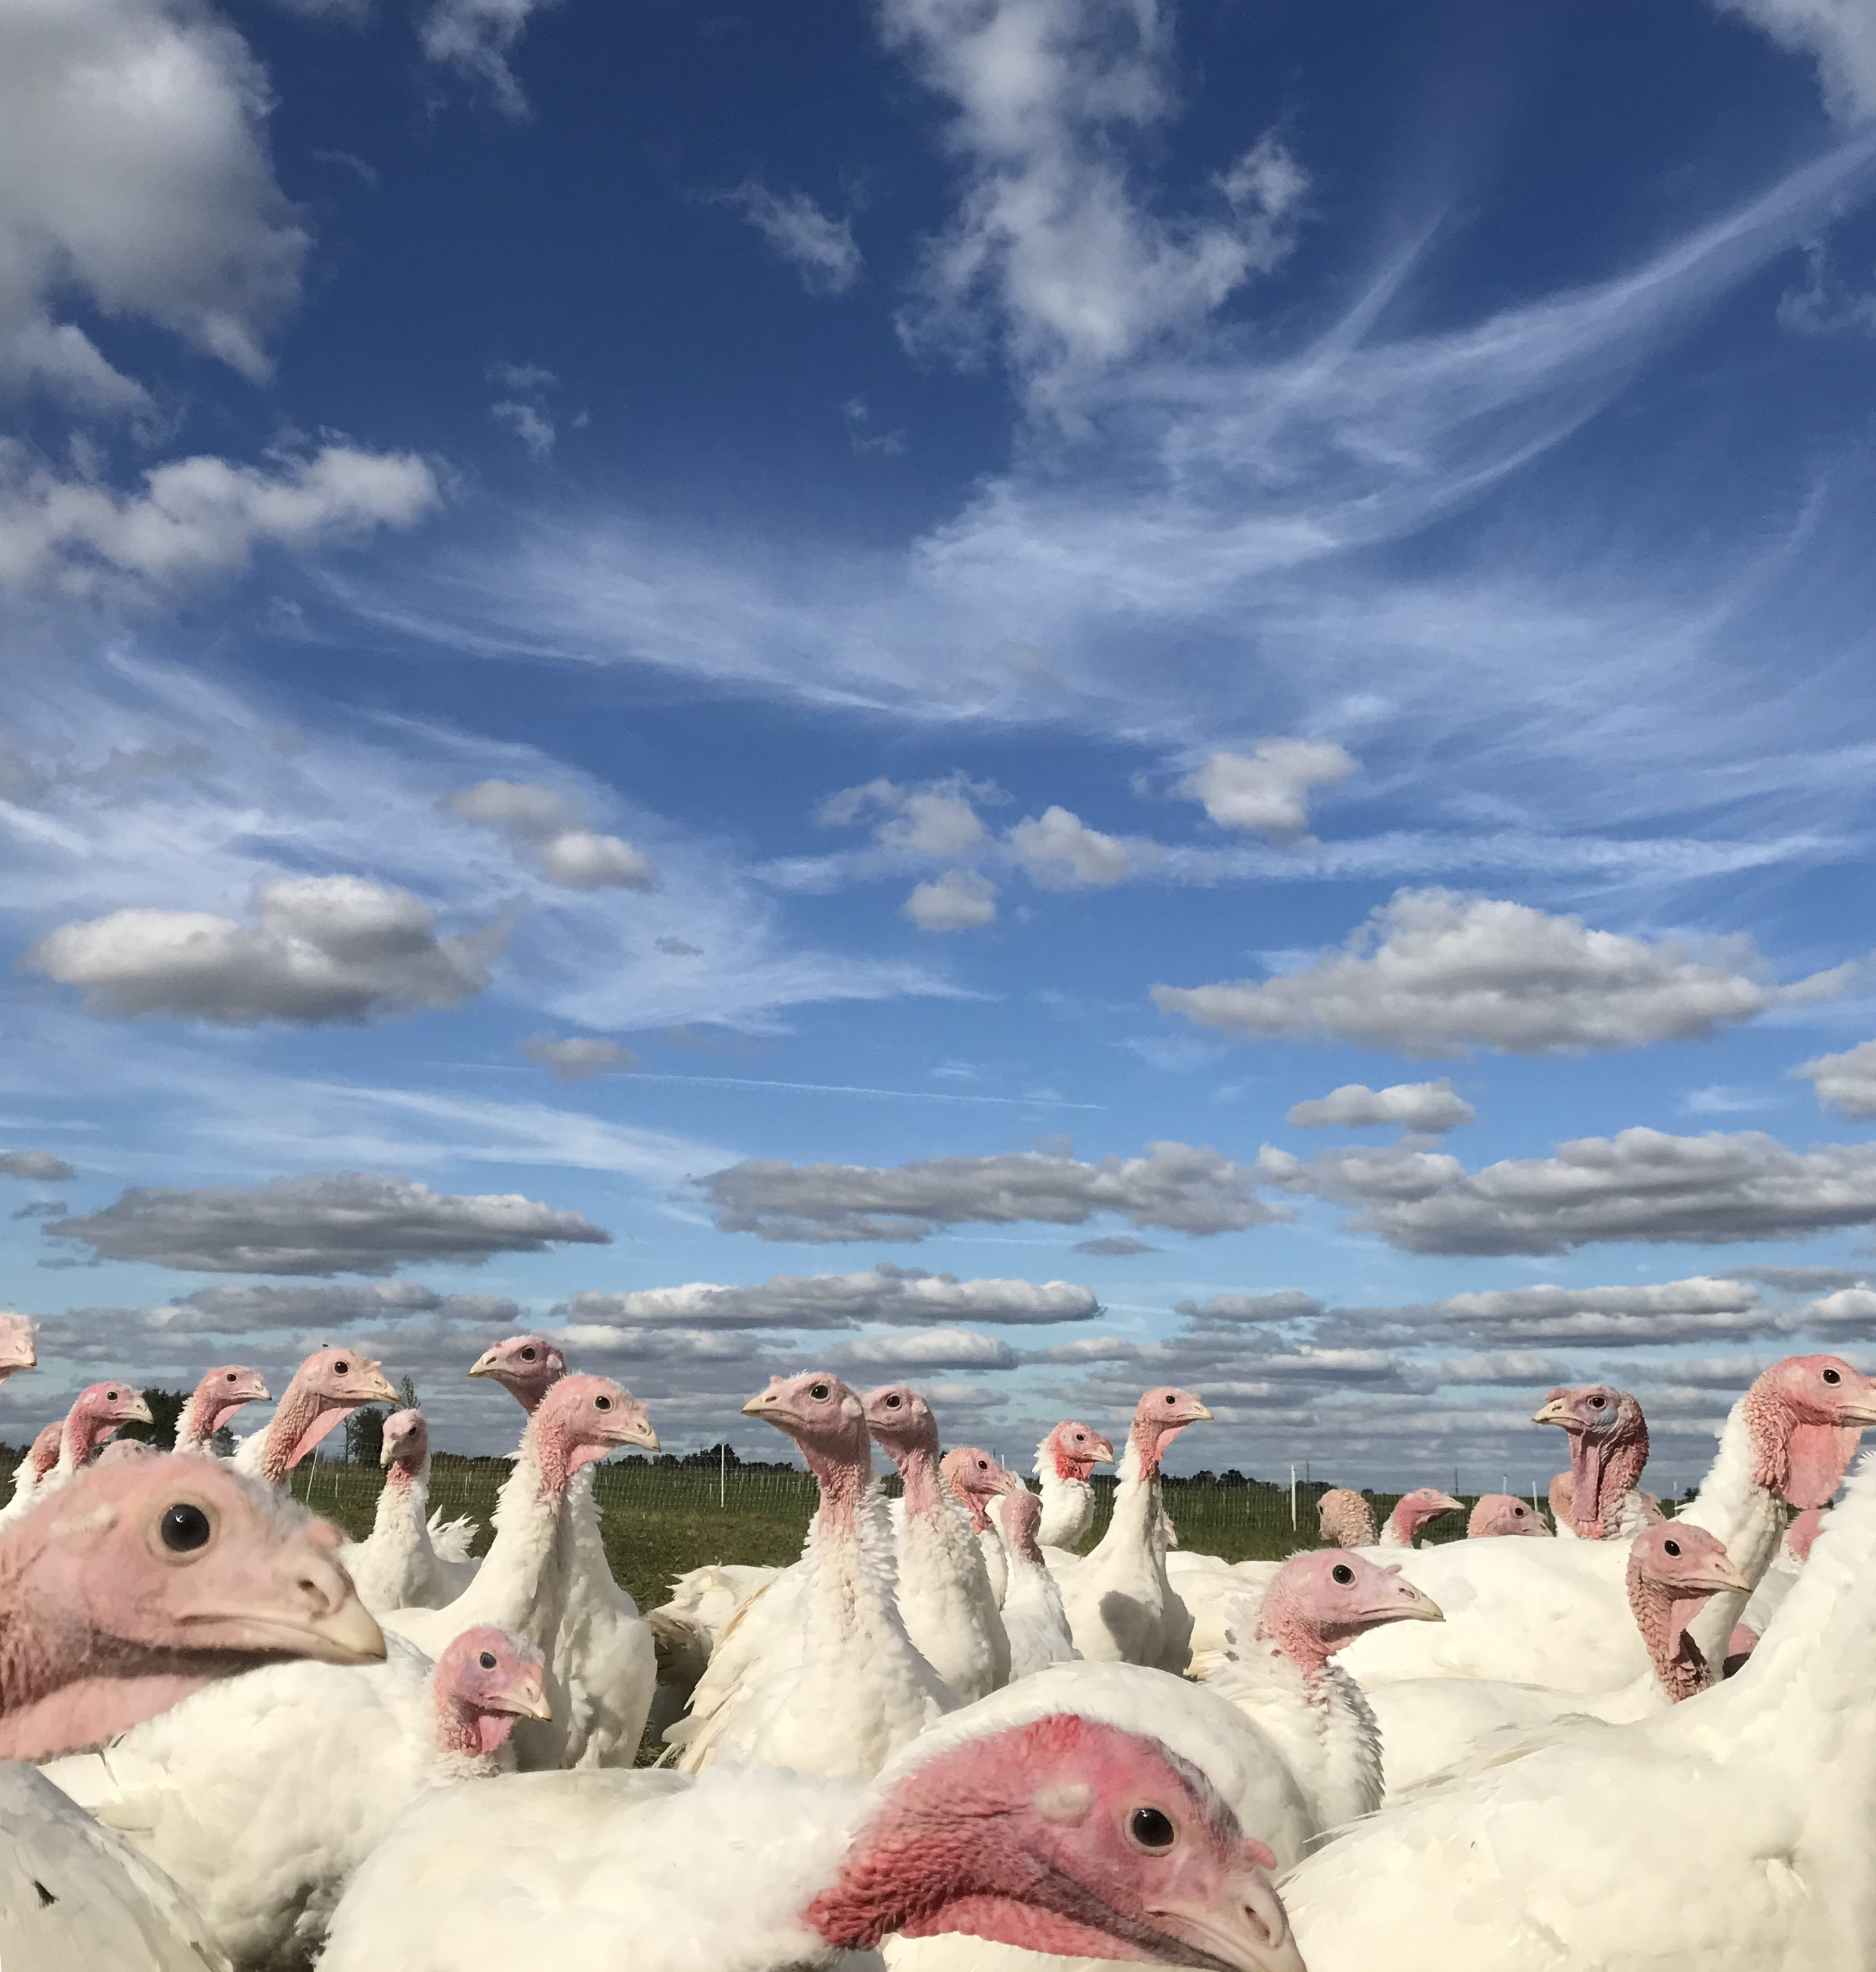 Next Happening: Farm Photo: Turkeys!